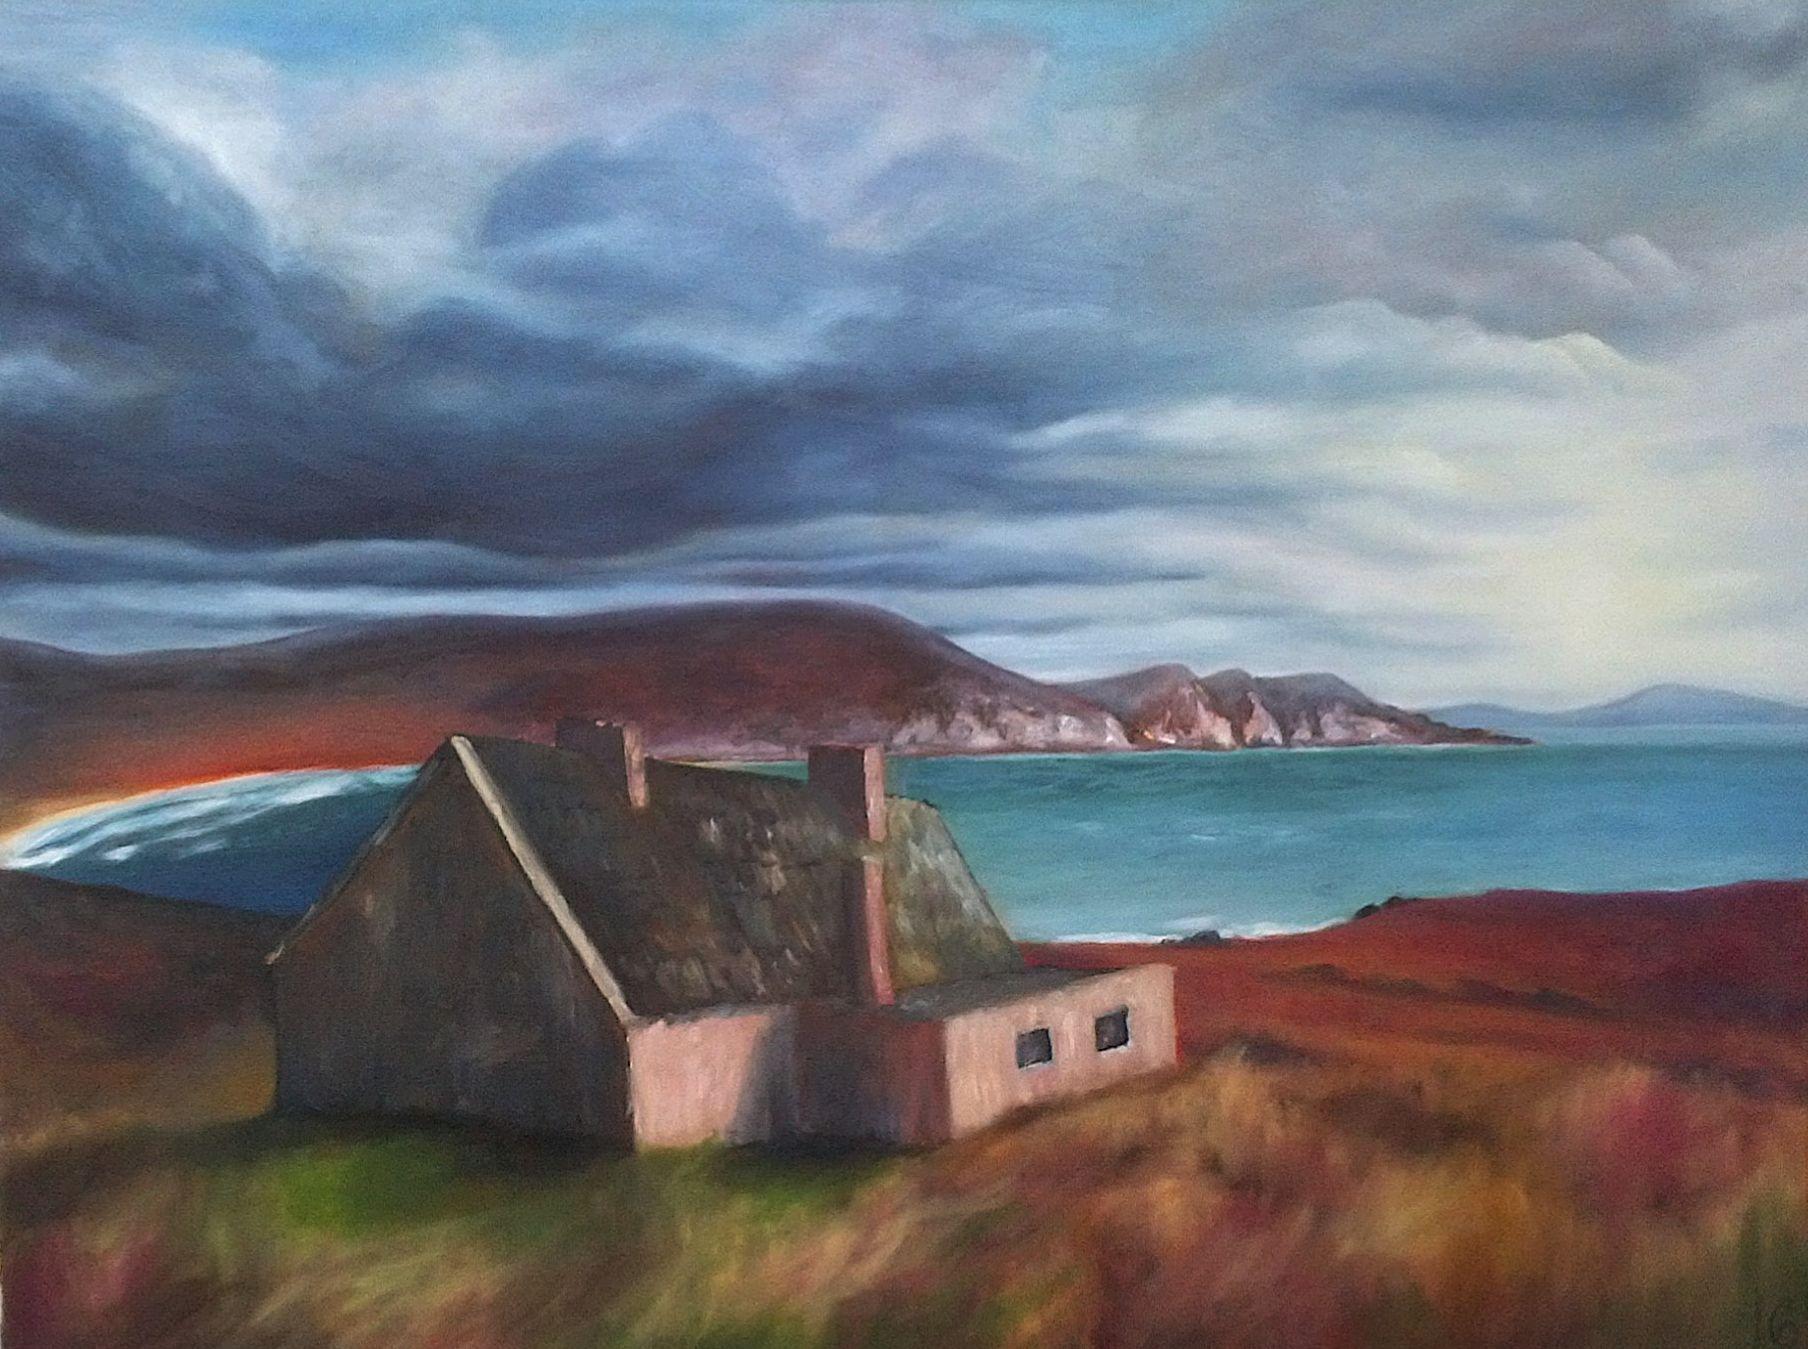 Irische See/ Irish Sea. Öl auf Leinwand/ Oil on canvas. 60 x 80 cm.